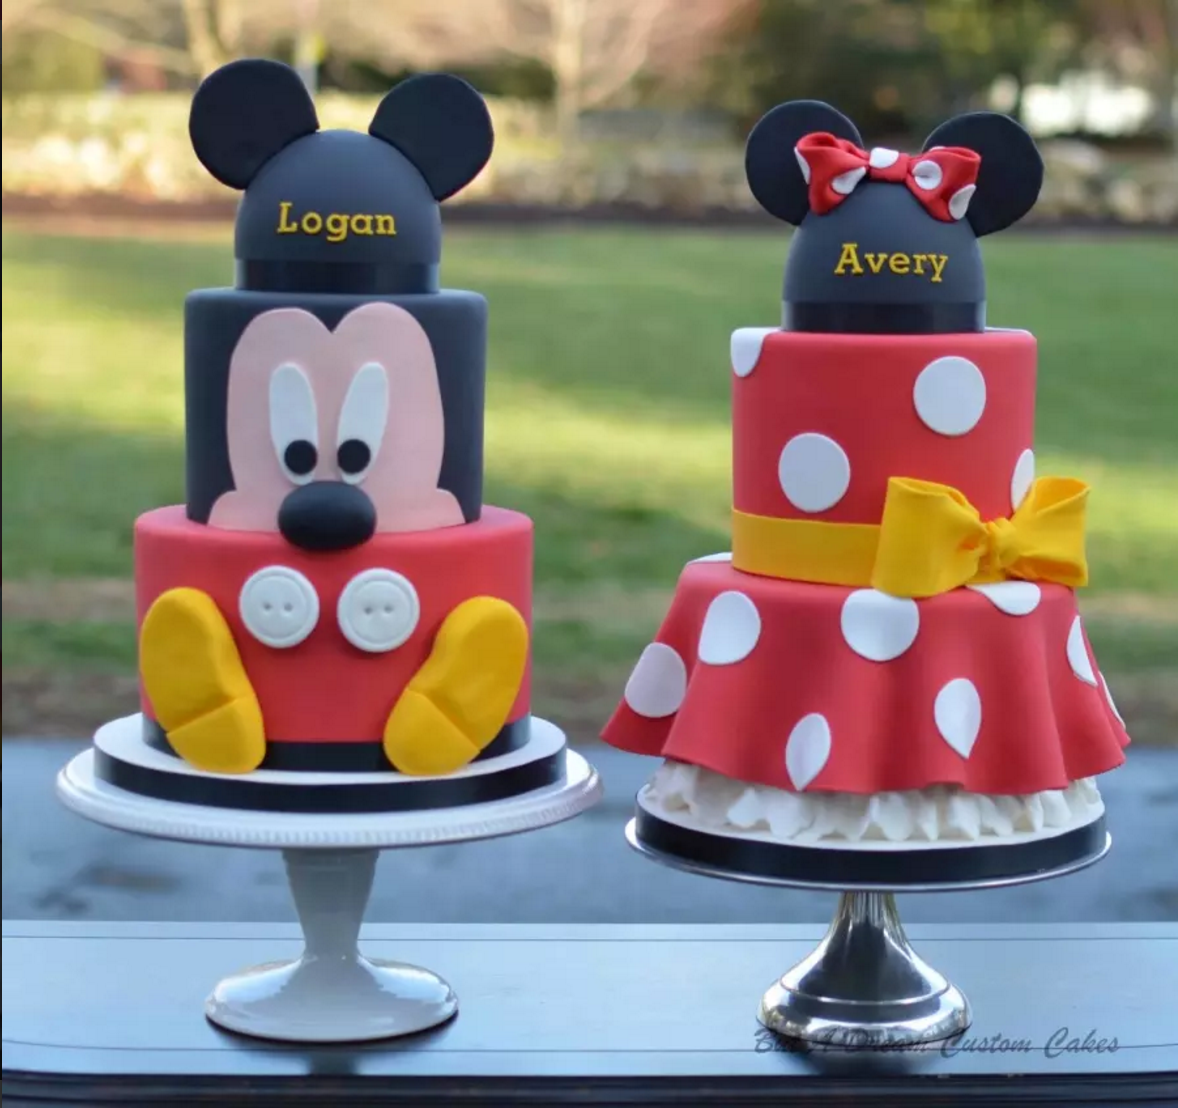 Birthday Party Ideas For Twins Mickey And Minnie Cake Mickey Cakes Minnie Cake